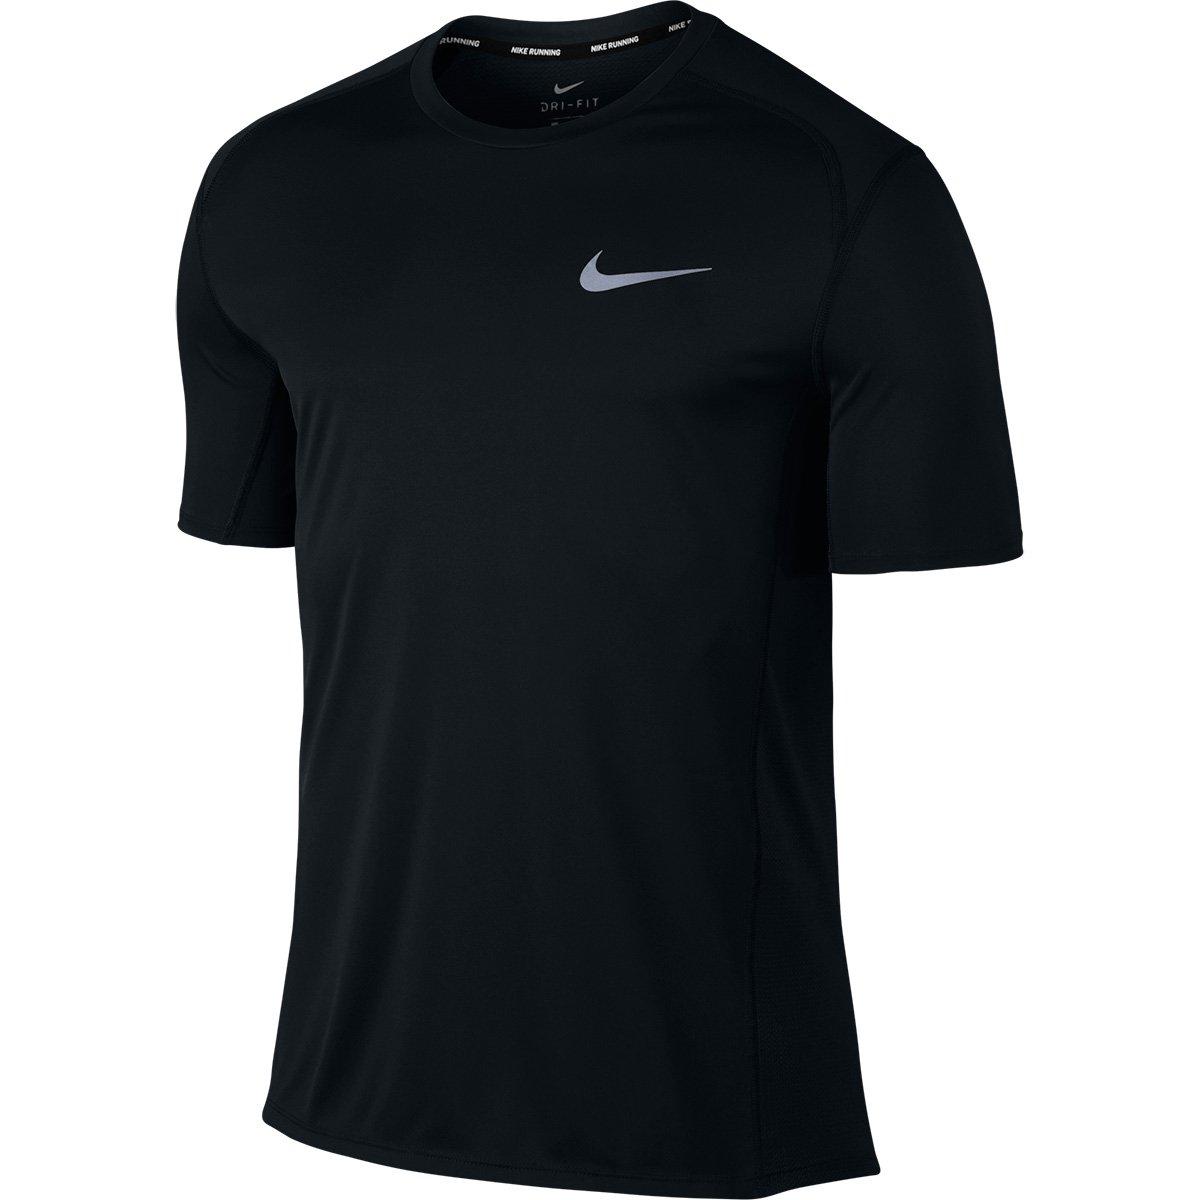 Camiseta Nike Dri-Fit Miler SS Masculina - Preto - Compre Agora ... 499e1edada71e